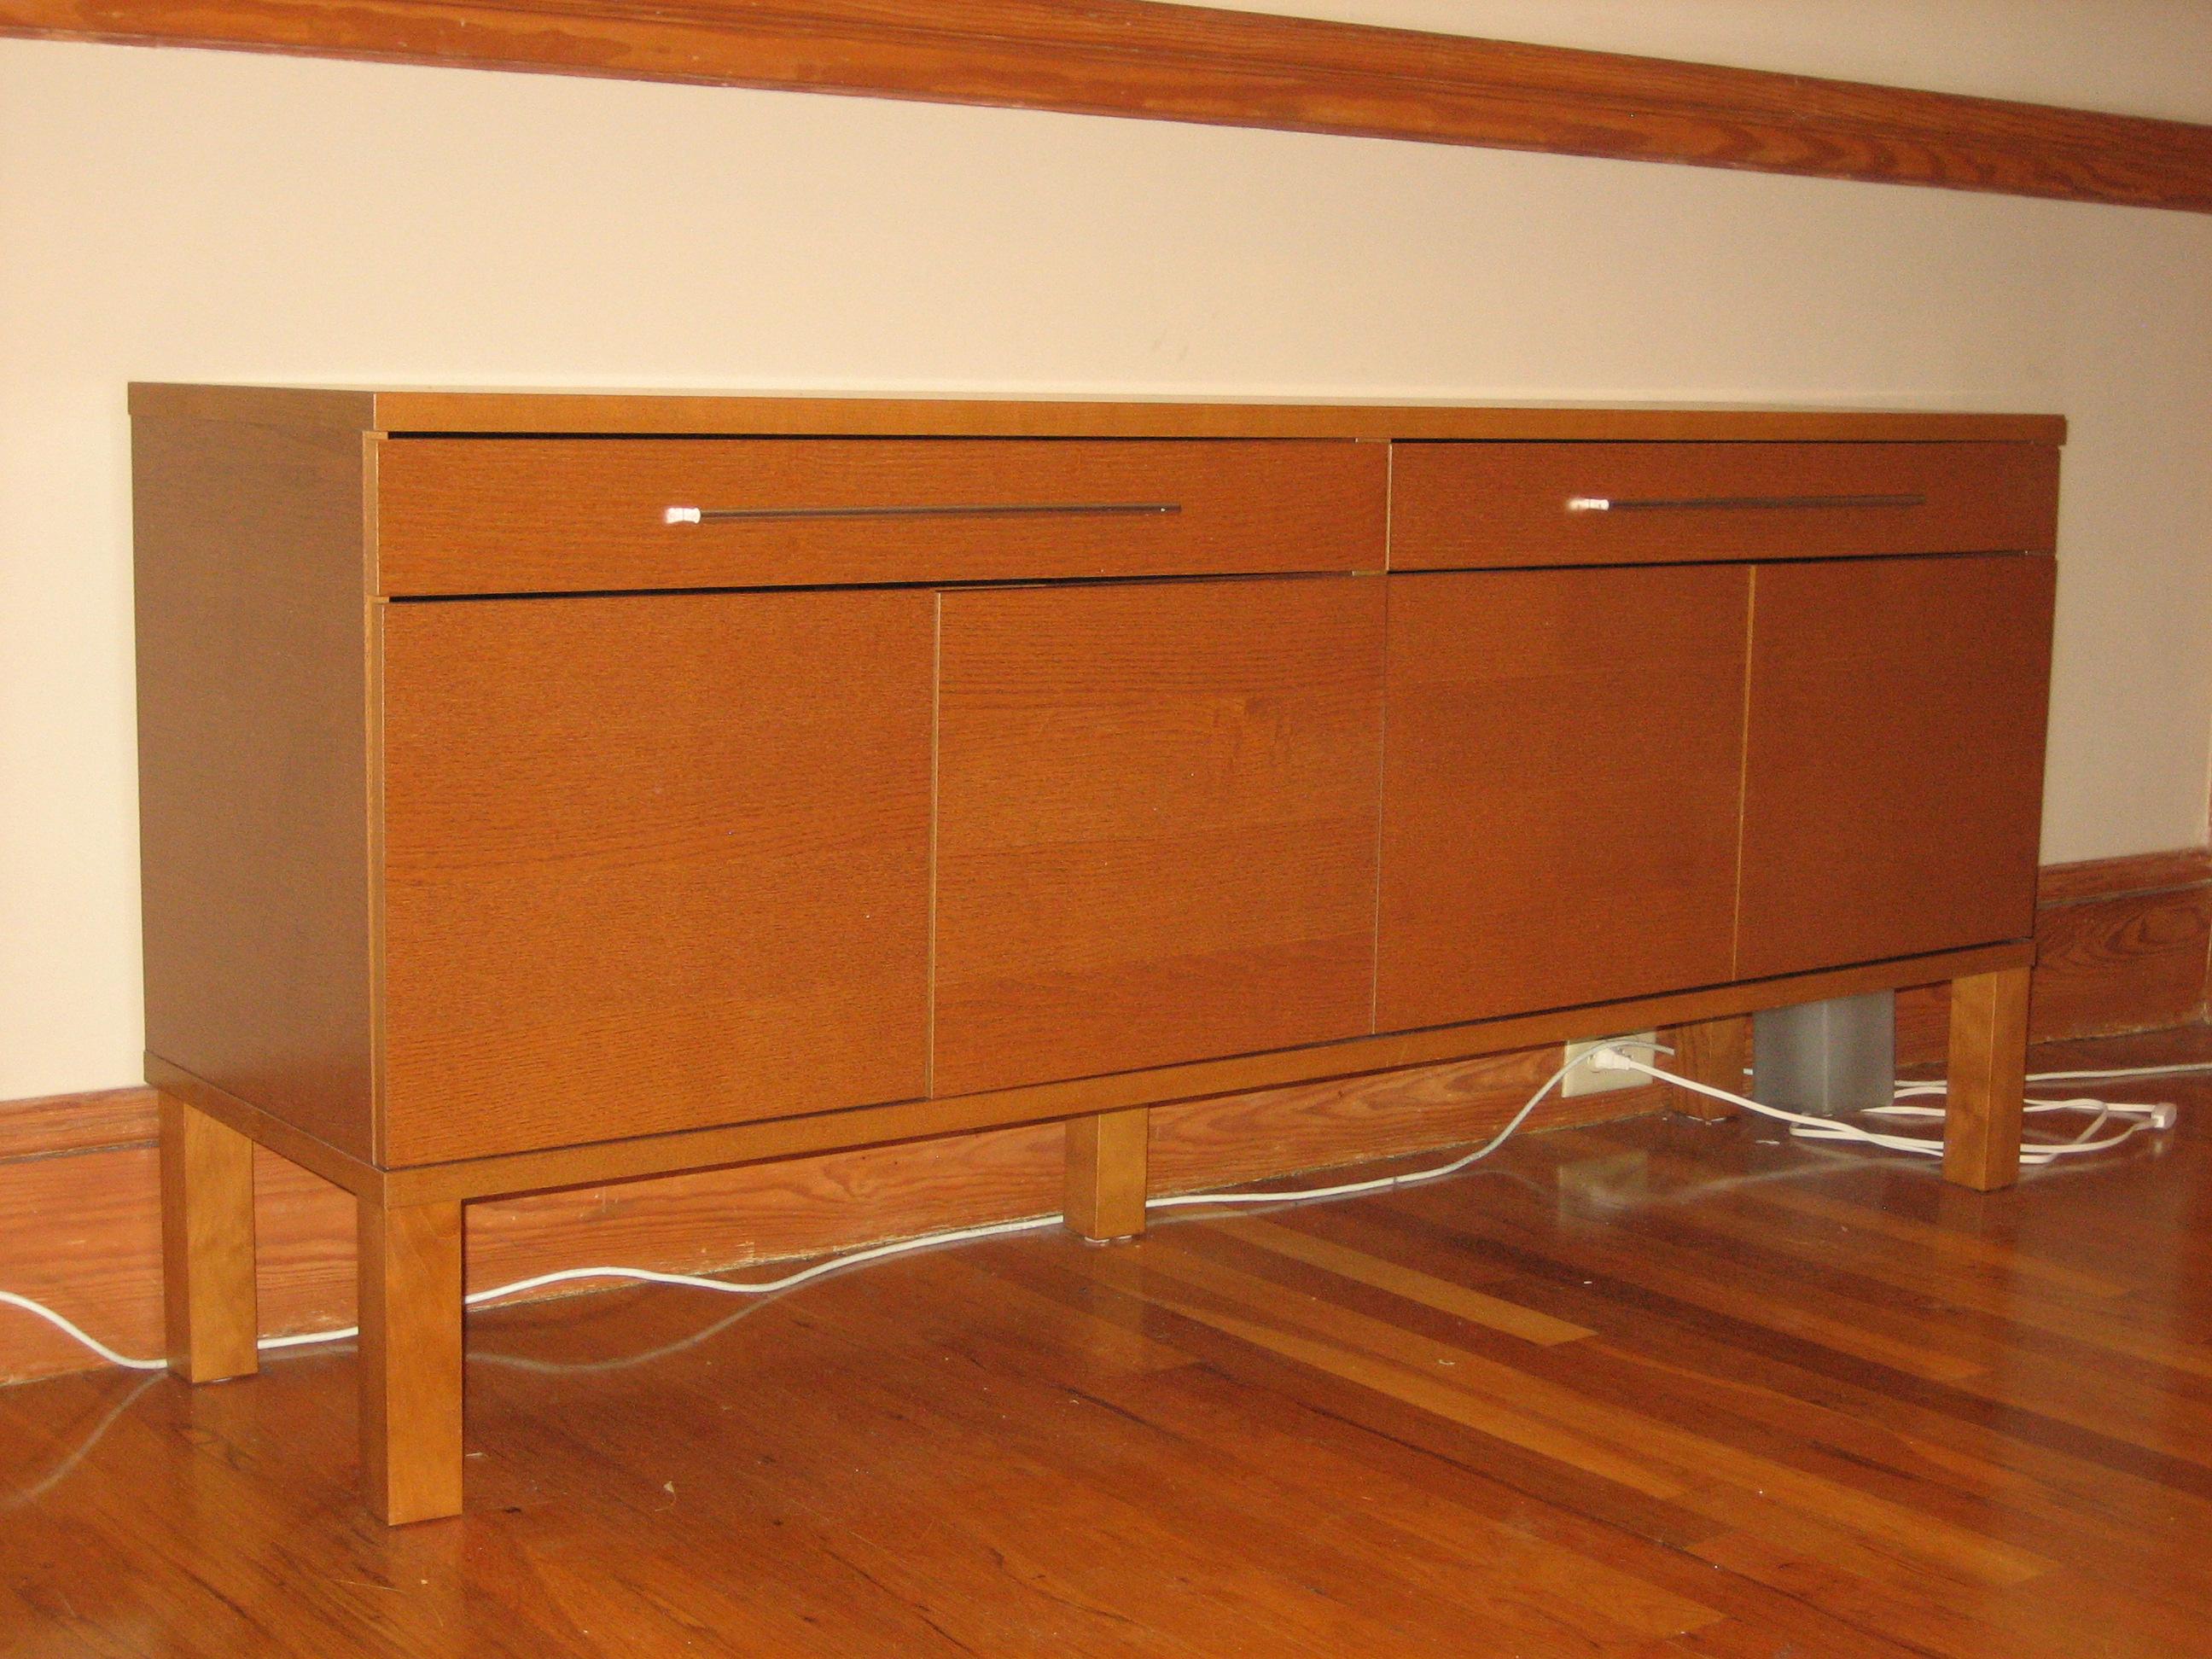 ikea sideboard buffet sideboard kommode elise 10 landhaus wei kommoden sideboards buffet. Black Bedroom Furniture Sets. Home Design Ideas